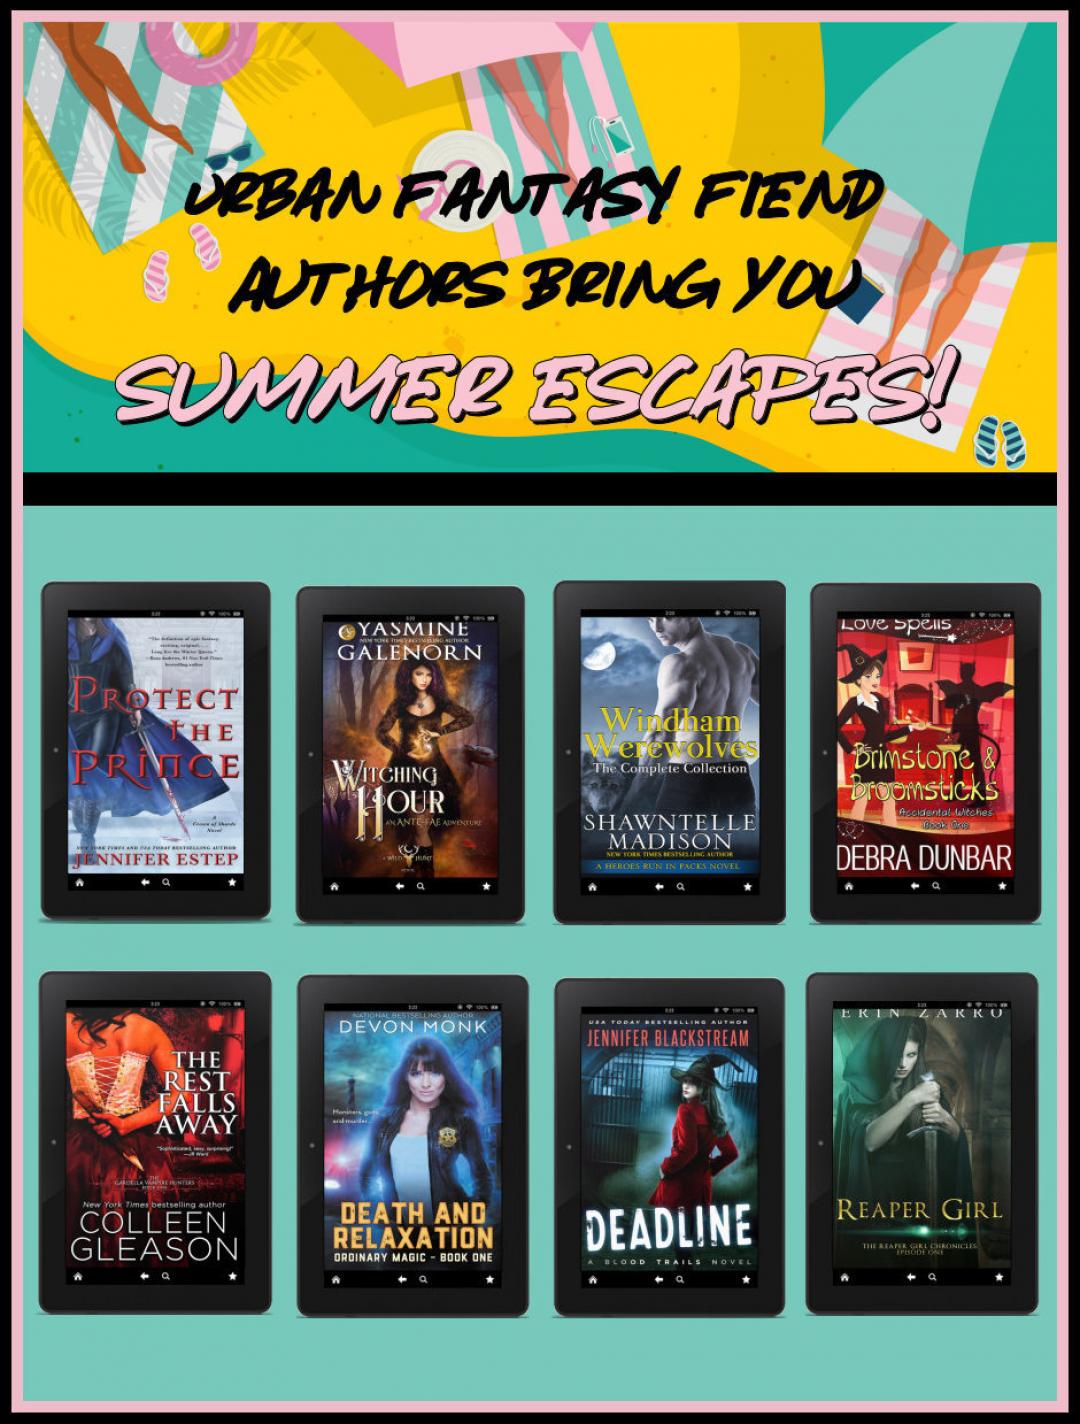 Urban Fantasy Fiend Authors Bring You Summer Escapes!